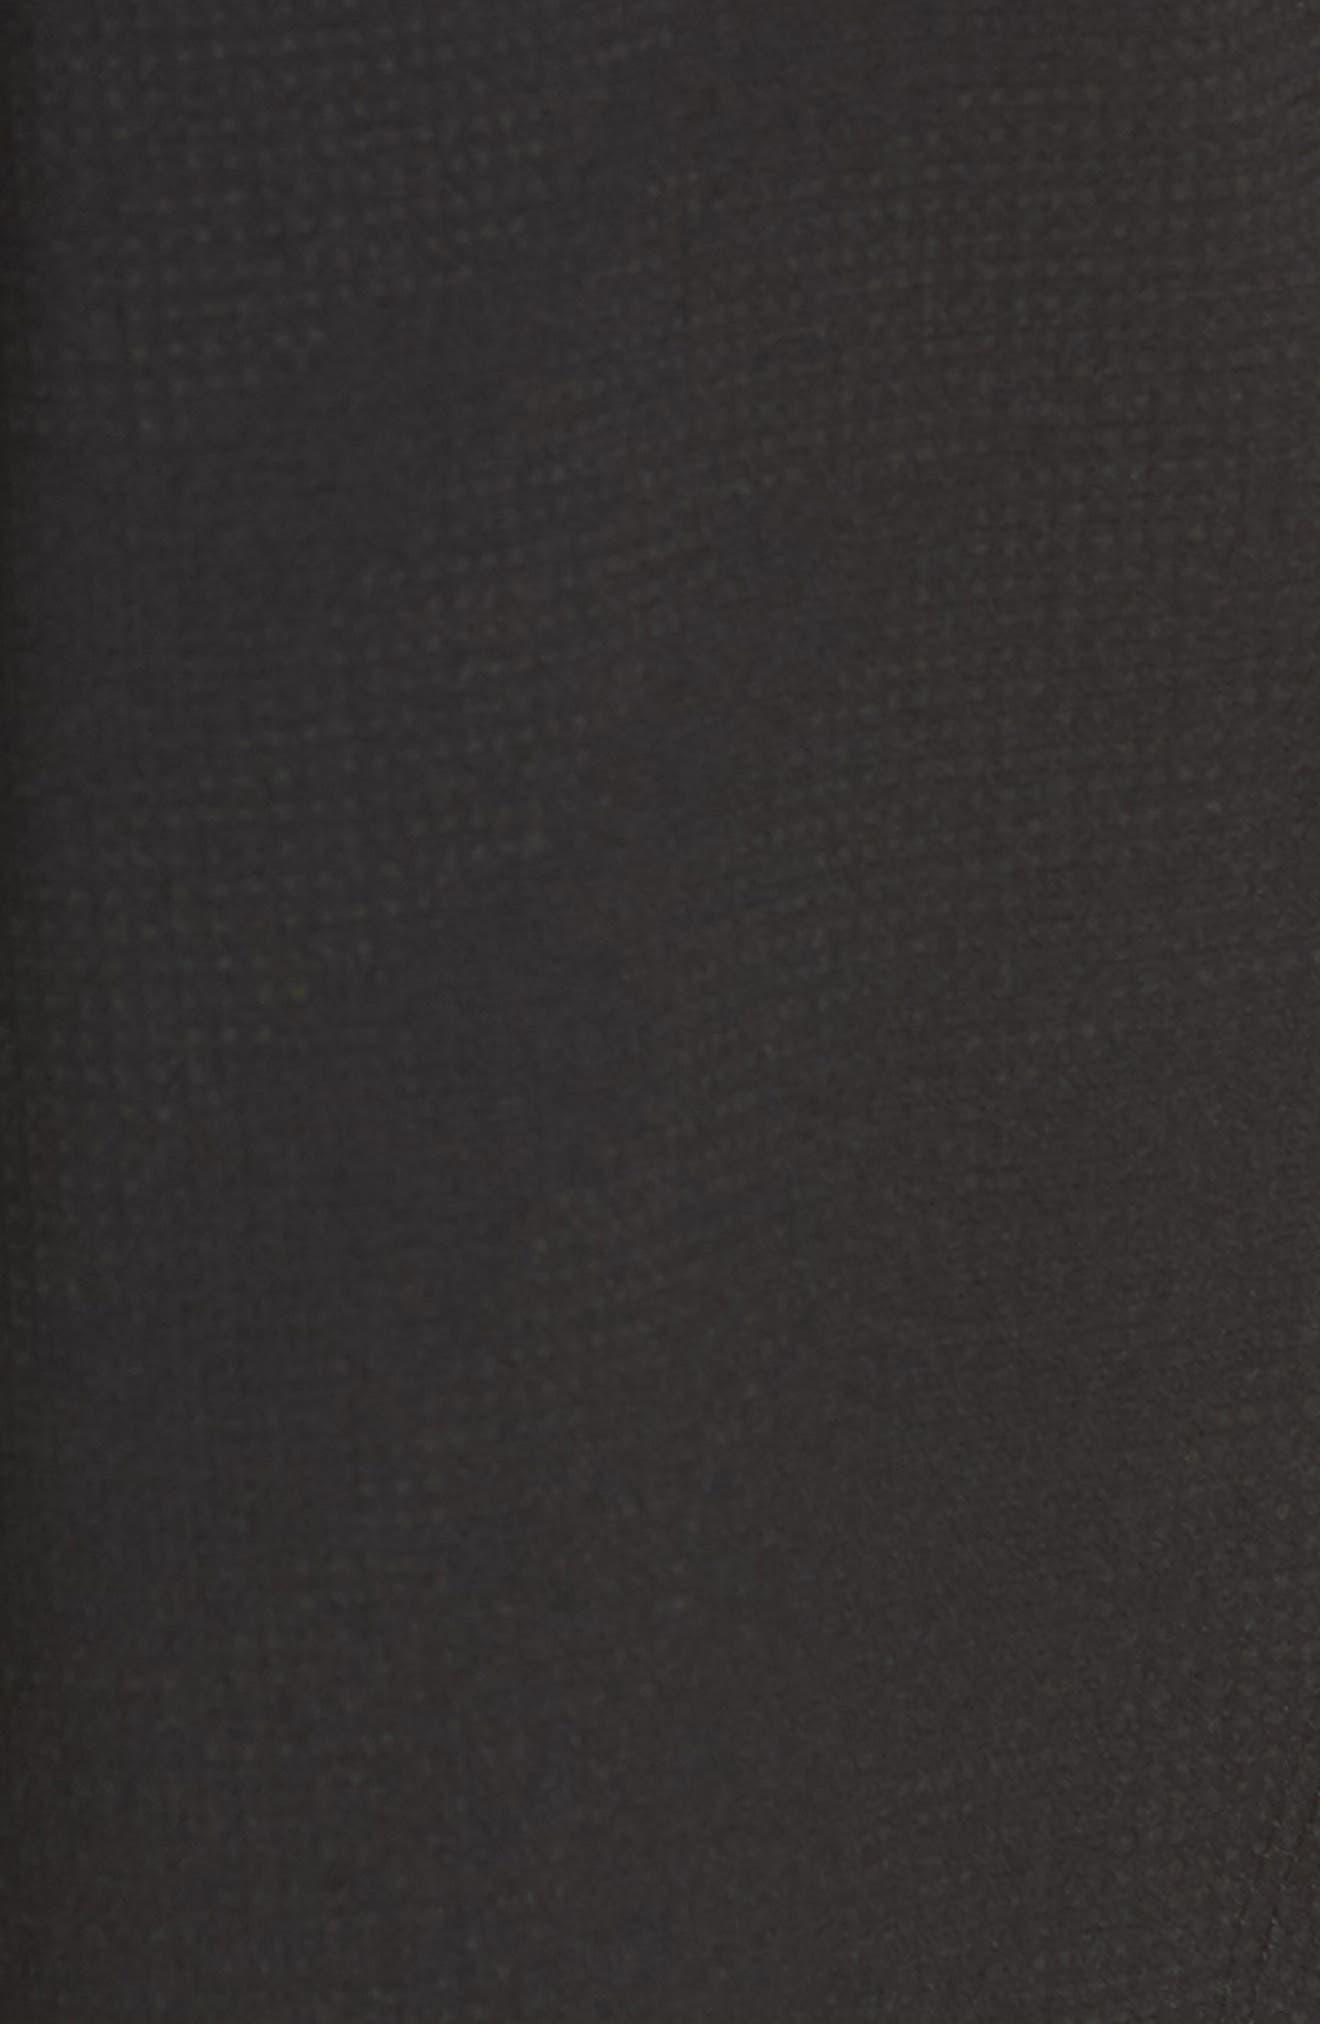 Camo Hype Reflective Regular Fit Shorts,                             Alternate thumbnail 5, color,                             001